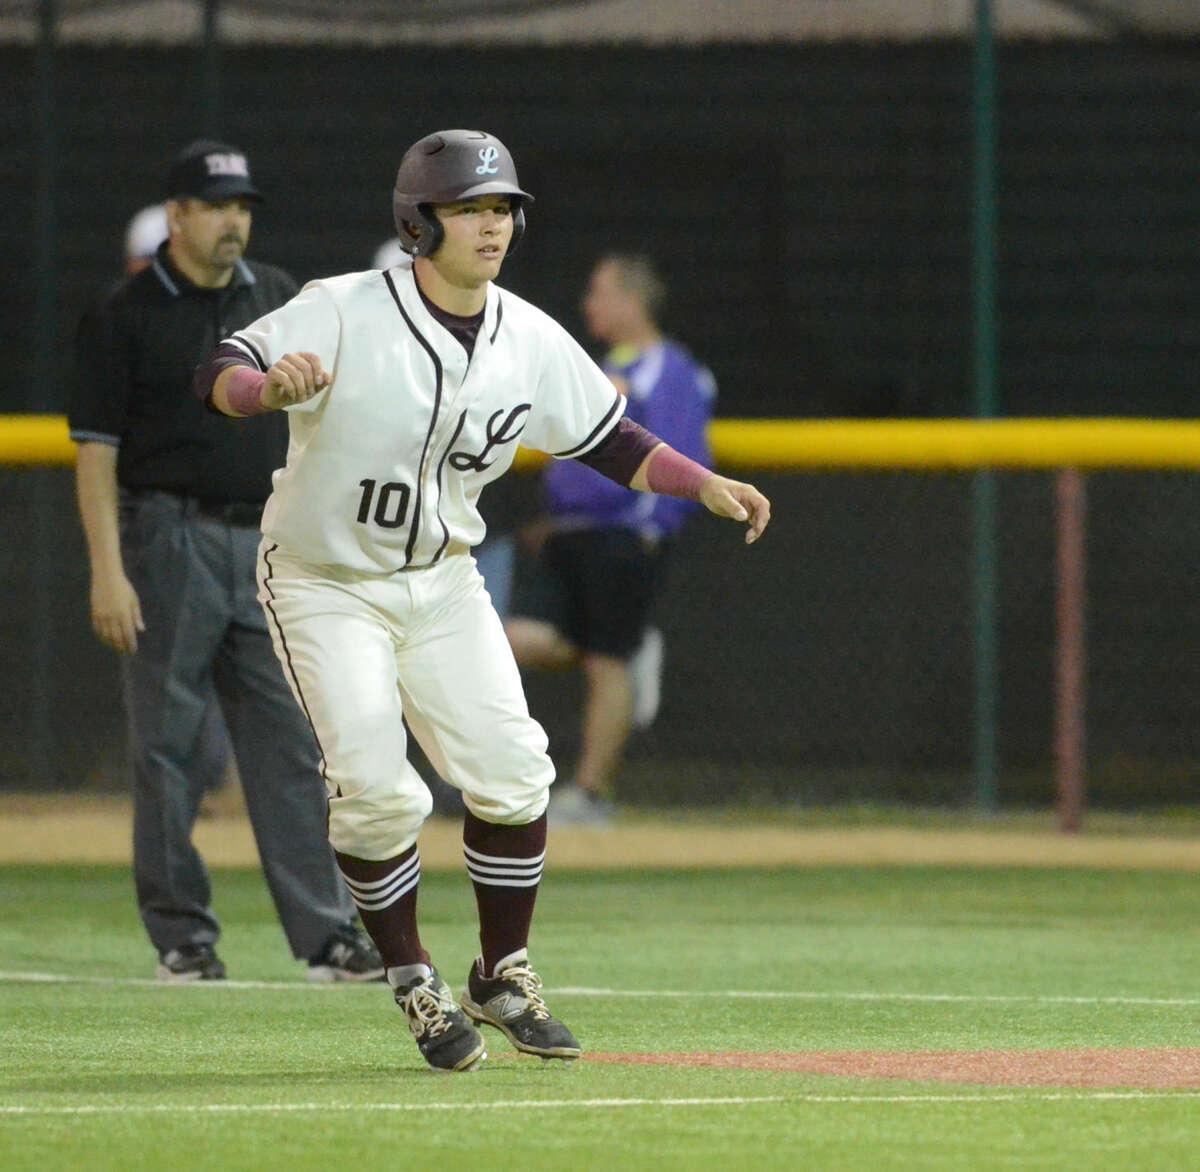 Lee High's Hunter Coleman leads off from first base against Midland High on Friday, April 10, 2015 at Christensen Stadium. James Durbin/Reporter-Telegram